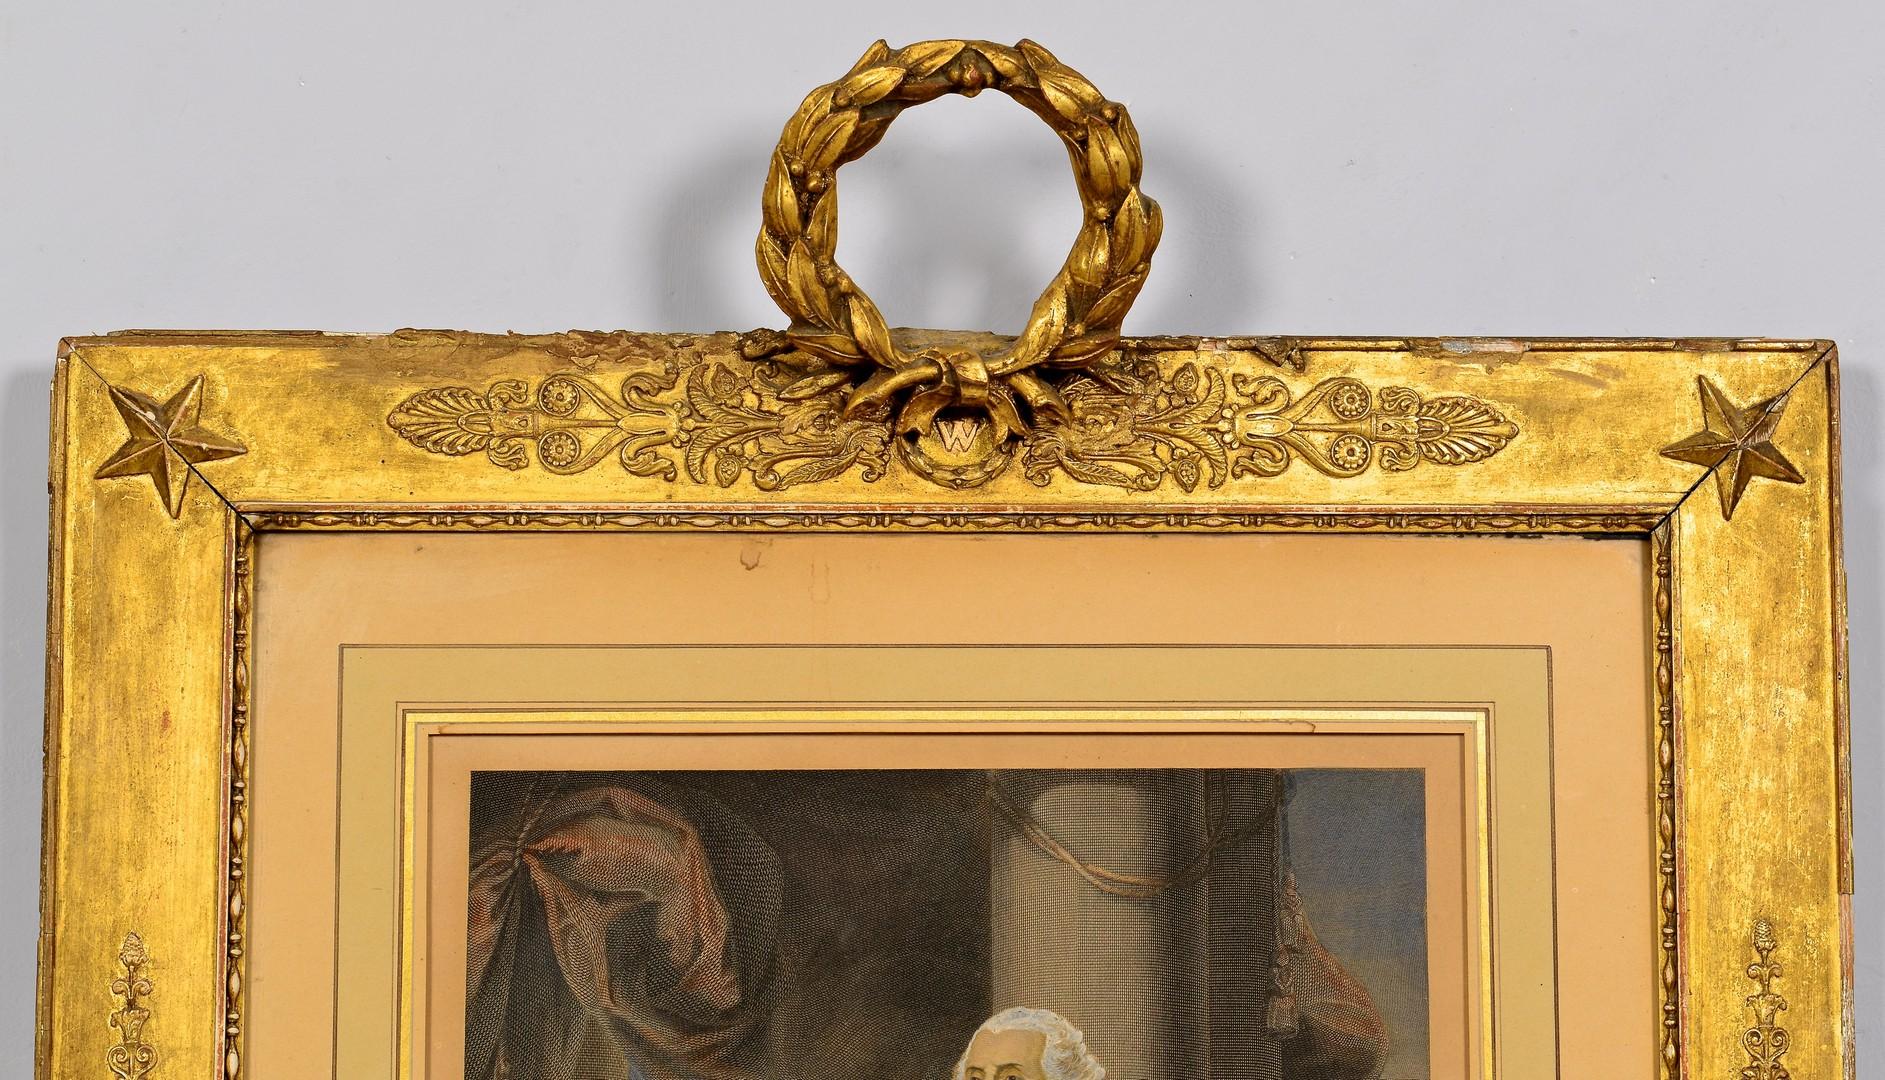 Lot 566: George Washington Engraving after Stuart